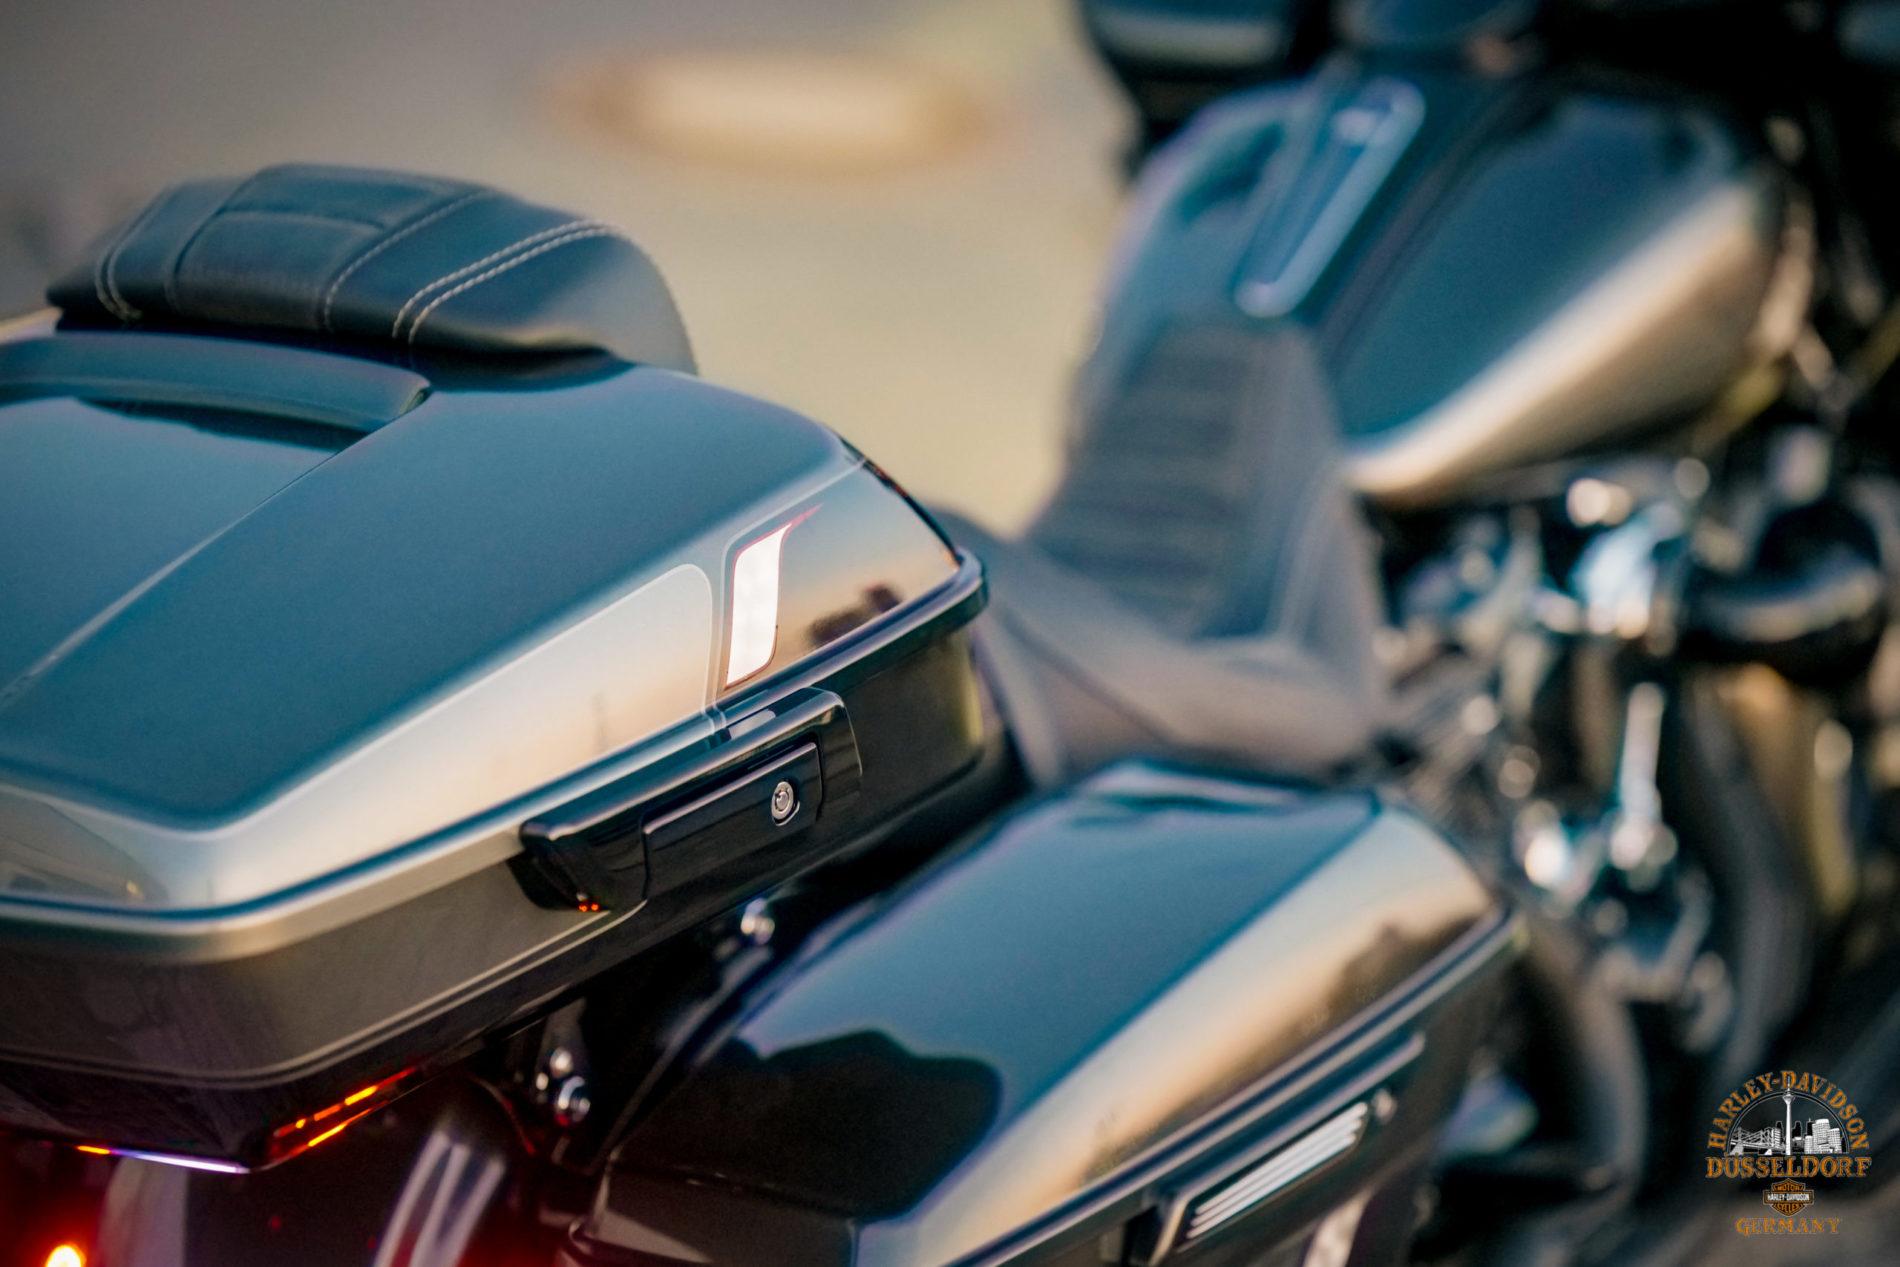 Road Glide Special 'Fat Tire' - Custombike - Umbau - Harley-Davidson Düsseldorf x Kodlin